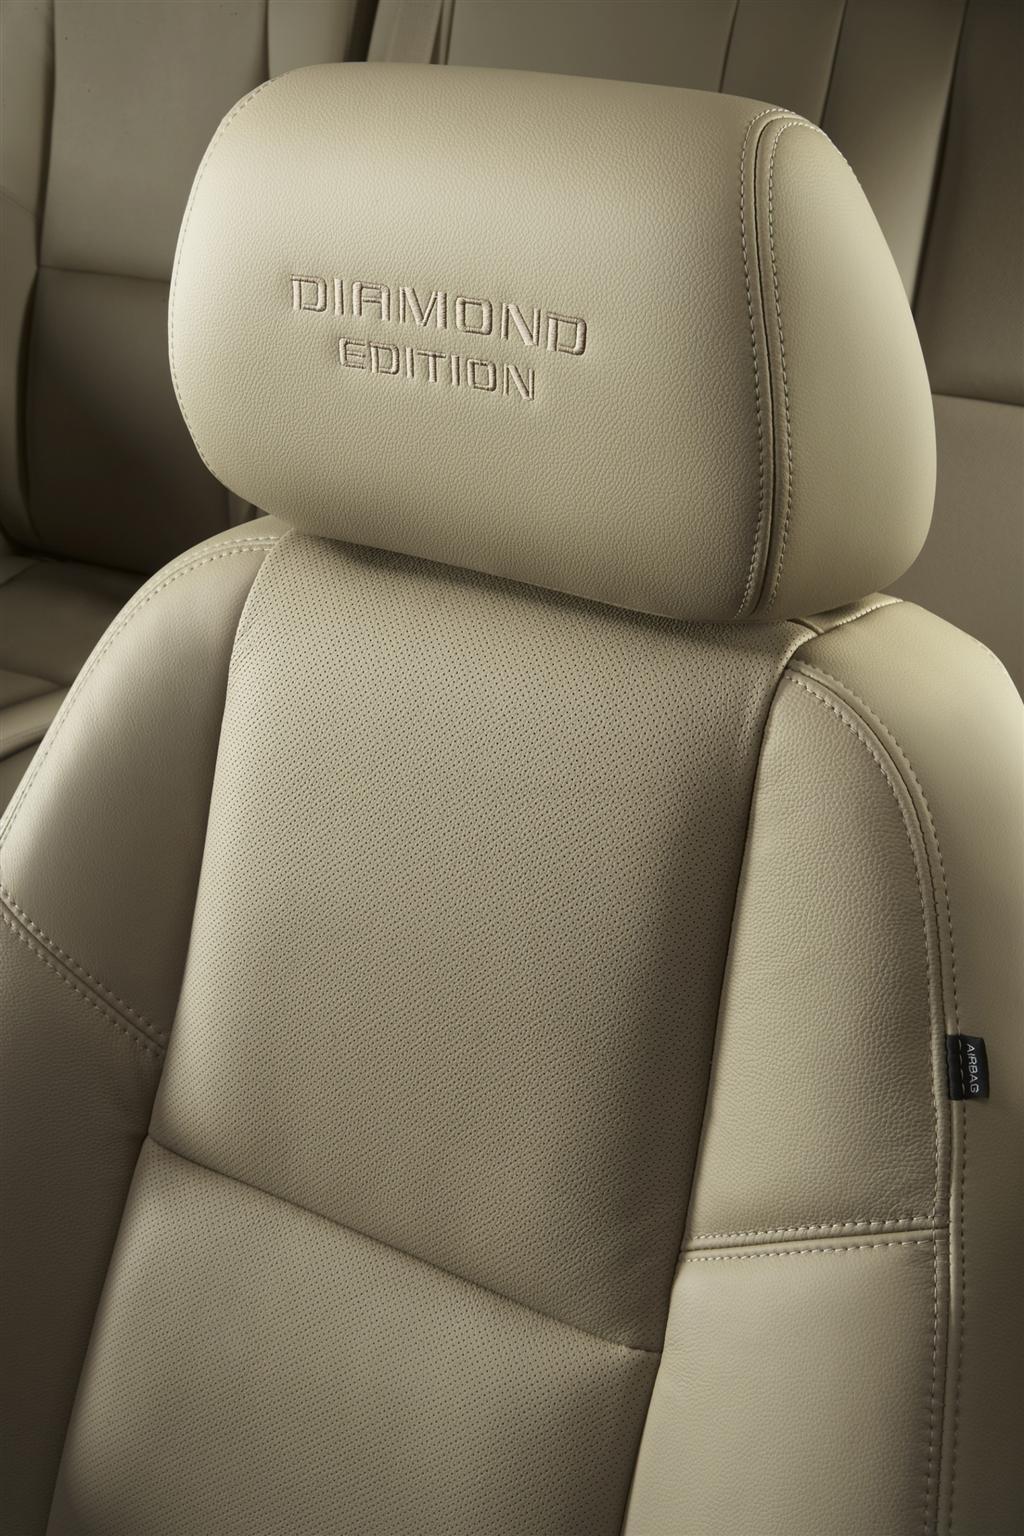 2010 Chevrolet Suburban 75th Anniversary Diamond Edition ...